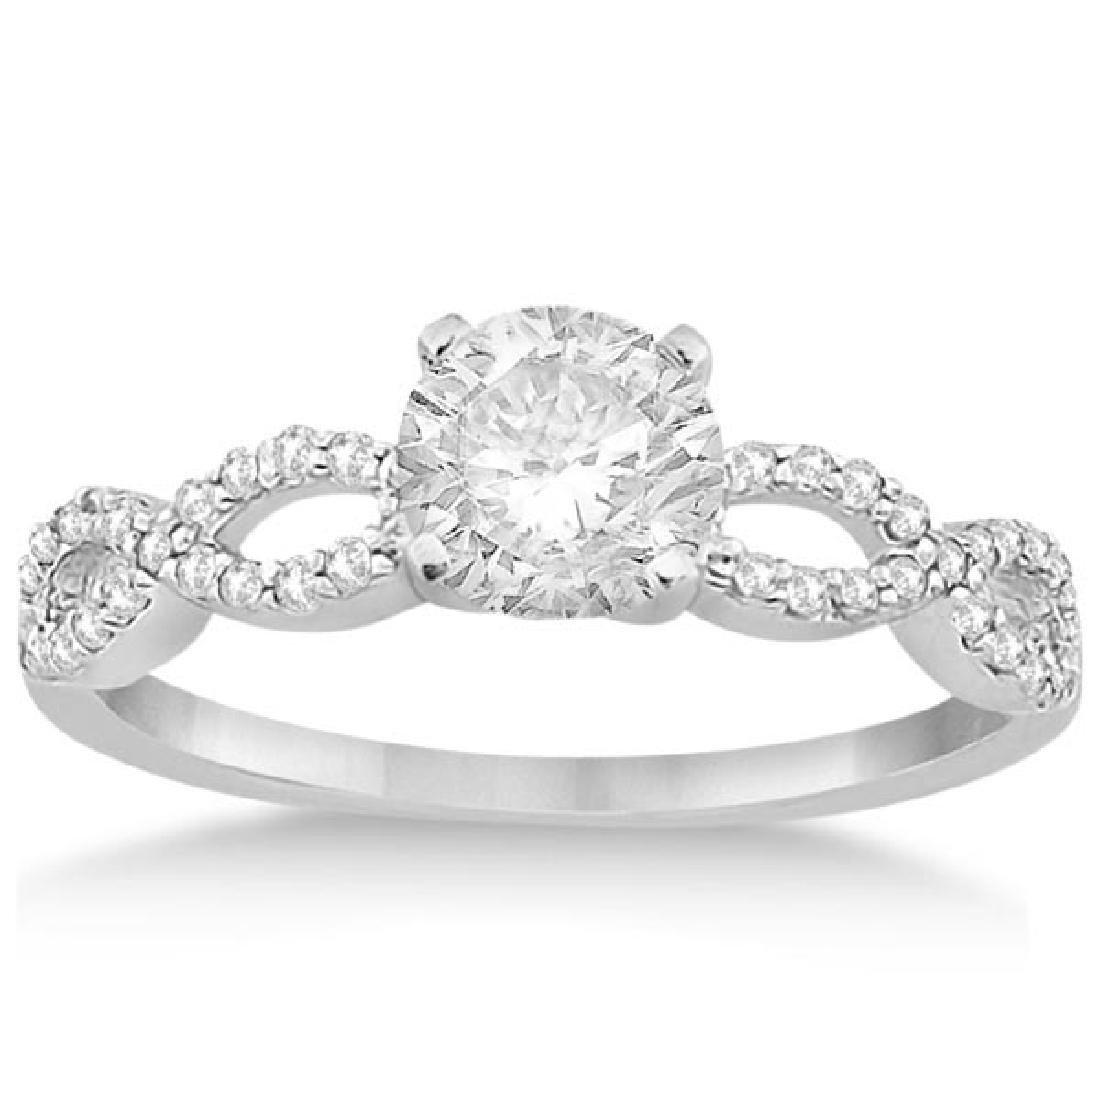 Edwardian Diamond Halo Engagement Ring Floral 14k White